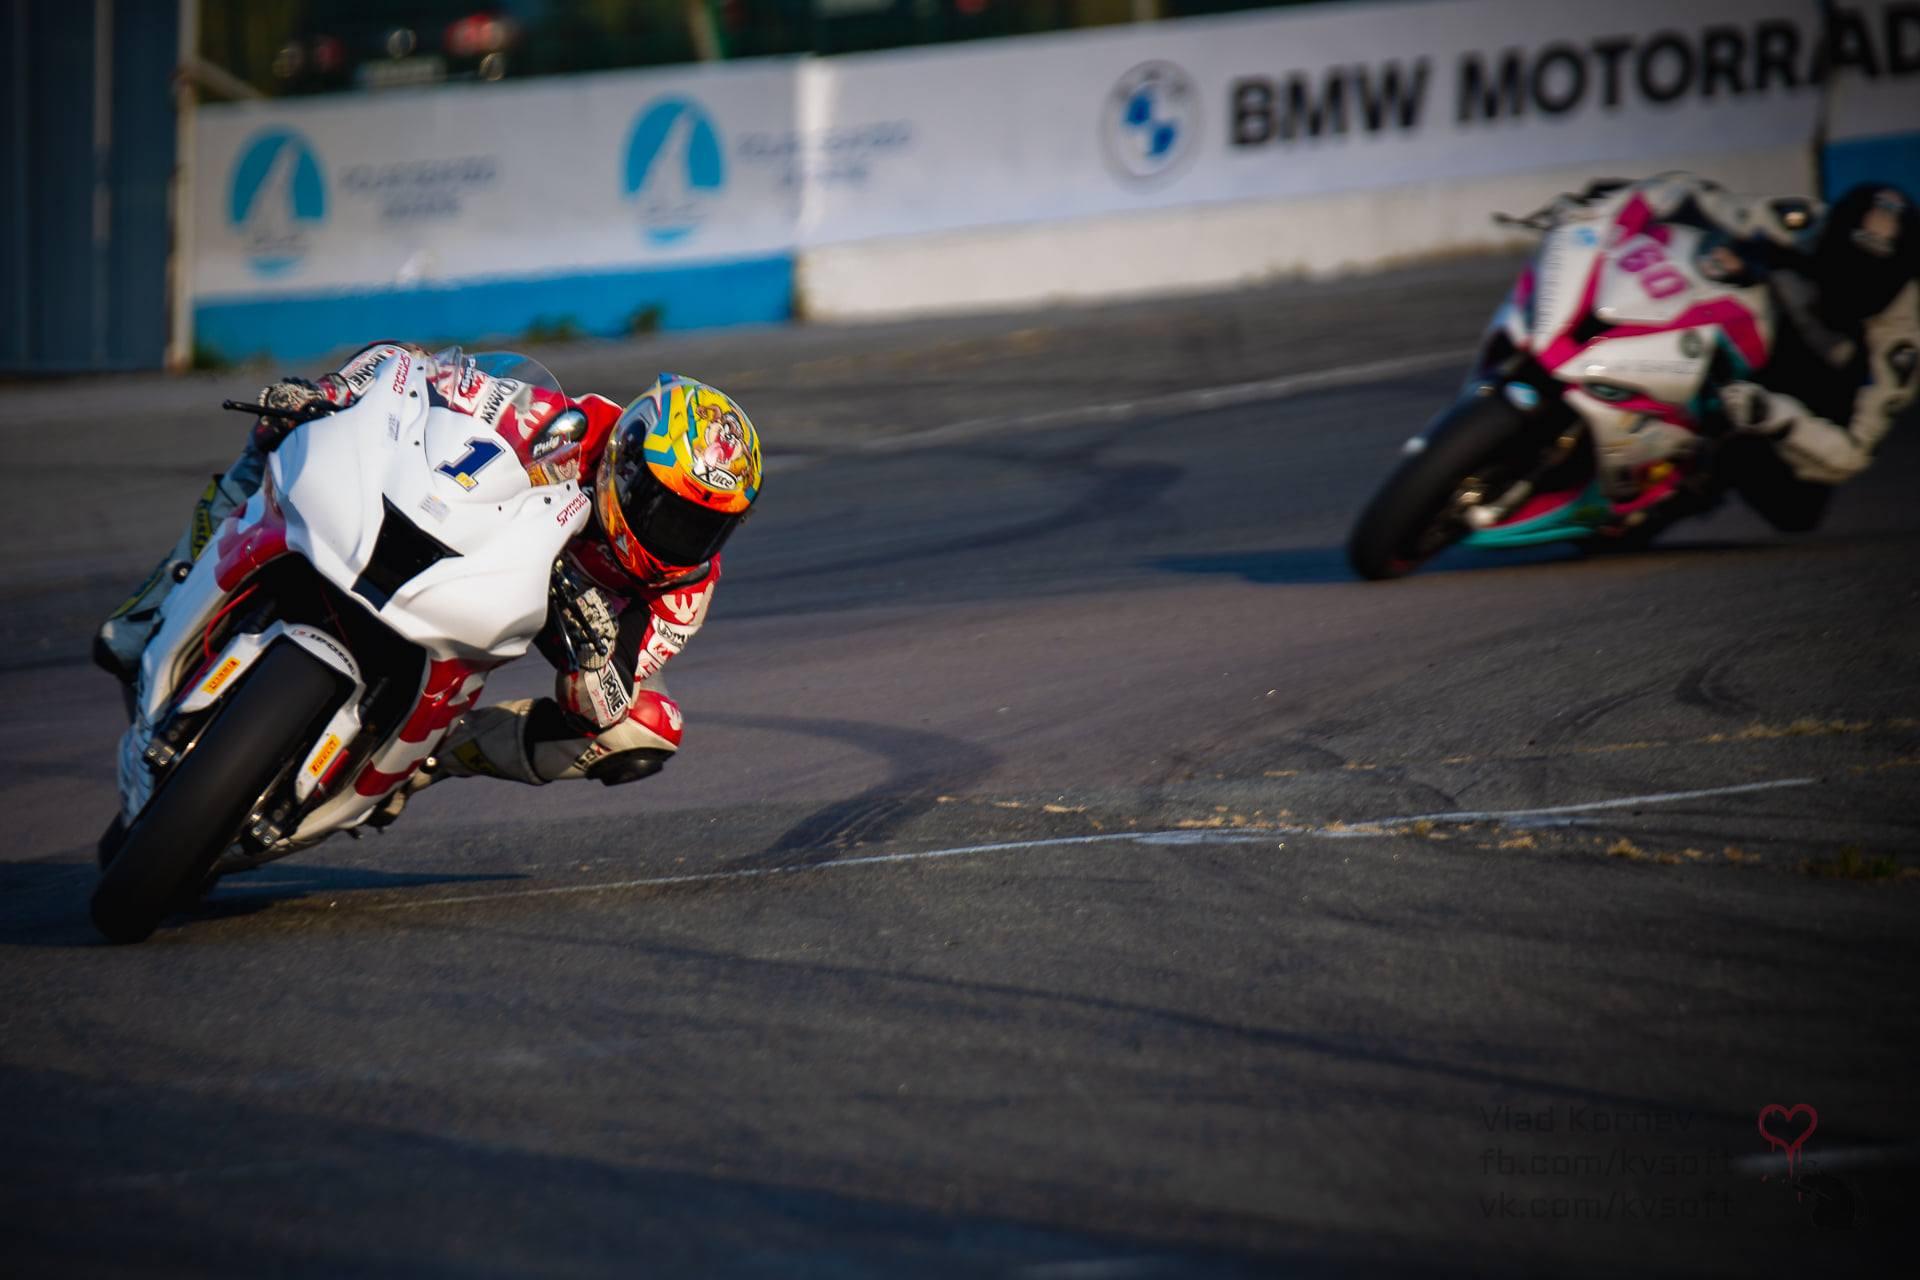 5-6_etap_MotoGPUkraine_048